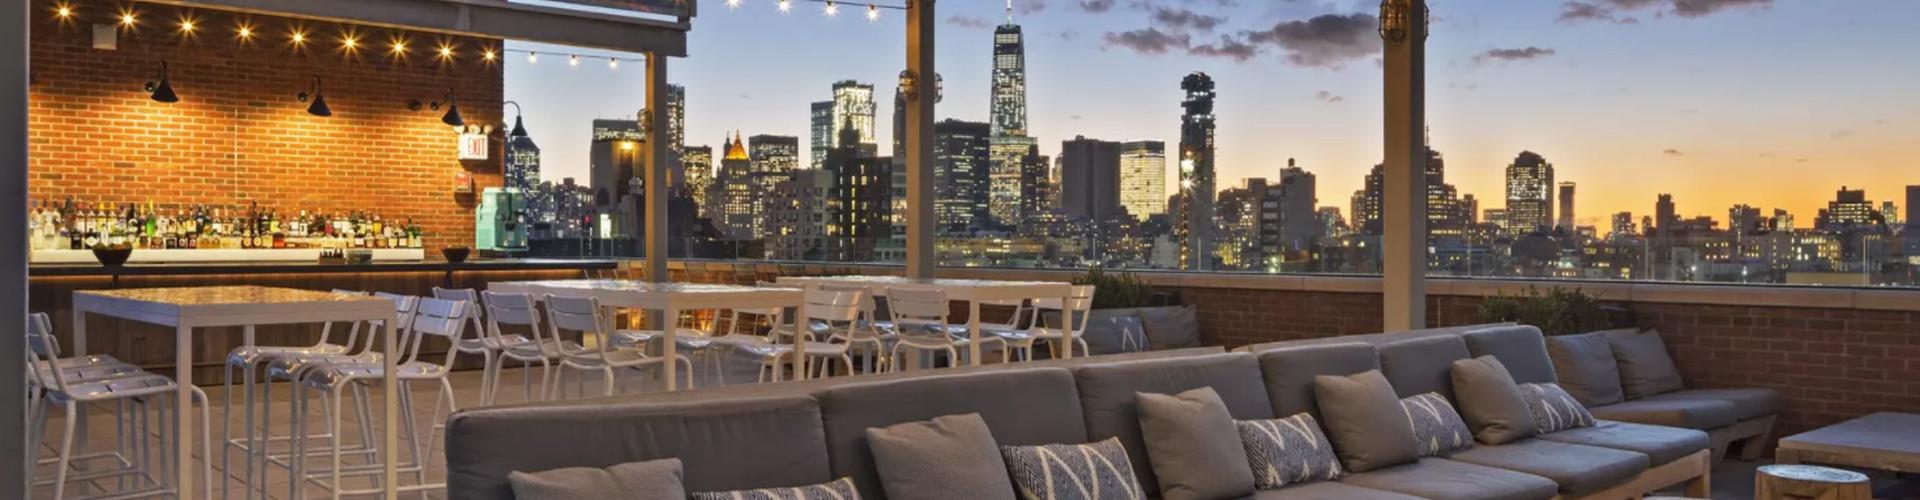 Top 5: NYC Hotel Bars & Signature Drinks